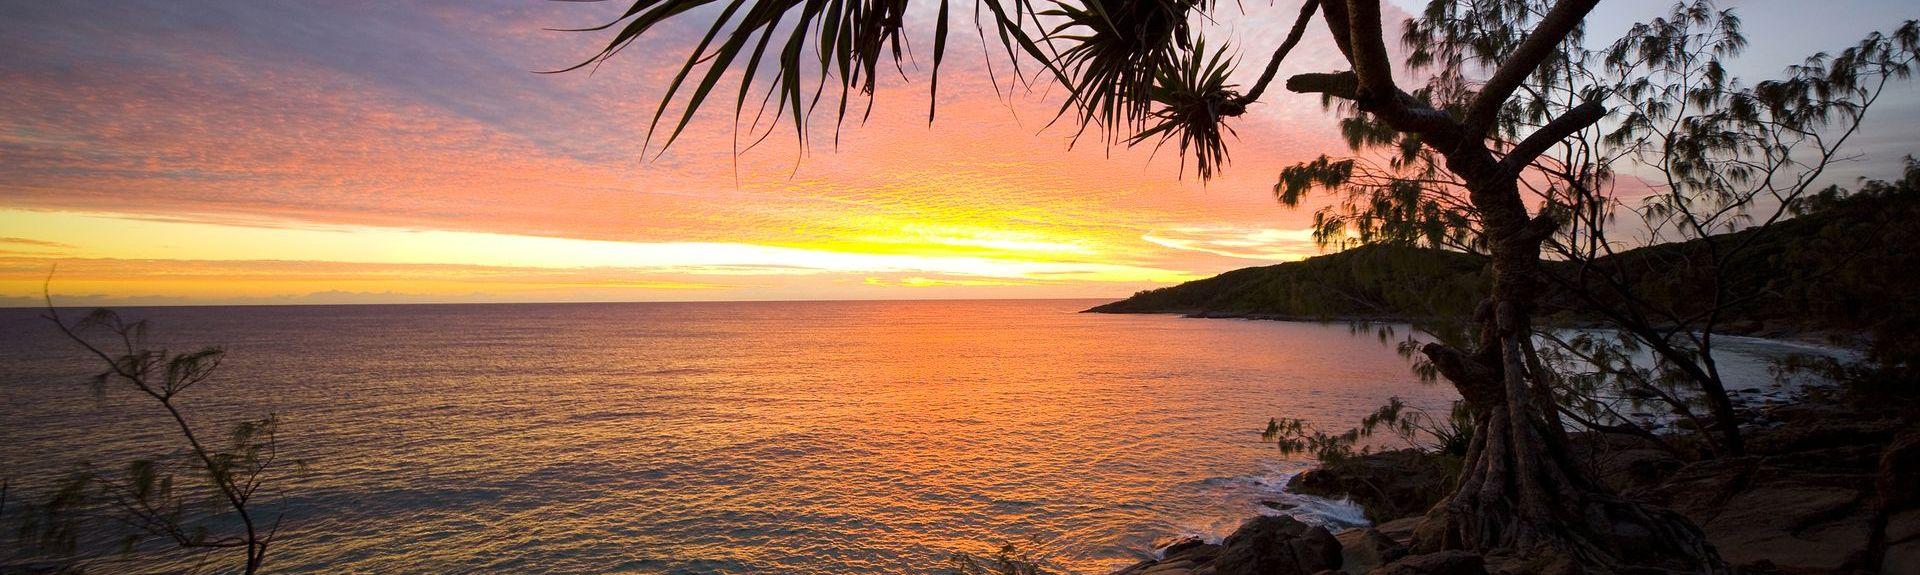 Sunrise Beach, Queensland, Austrália